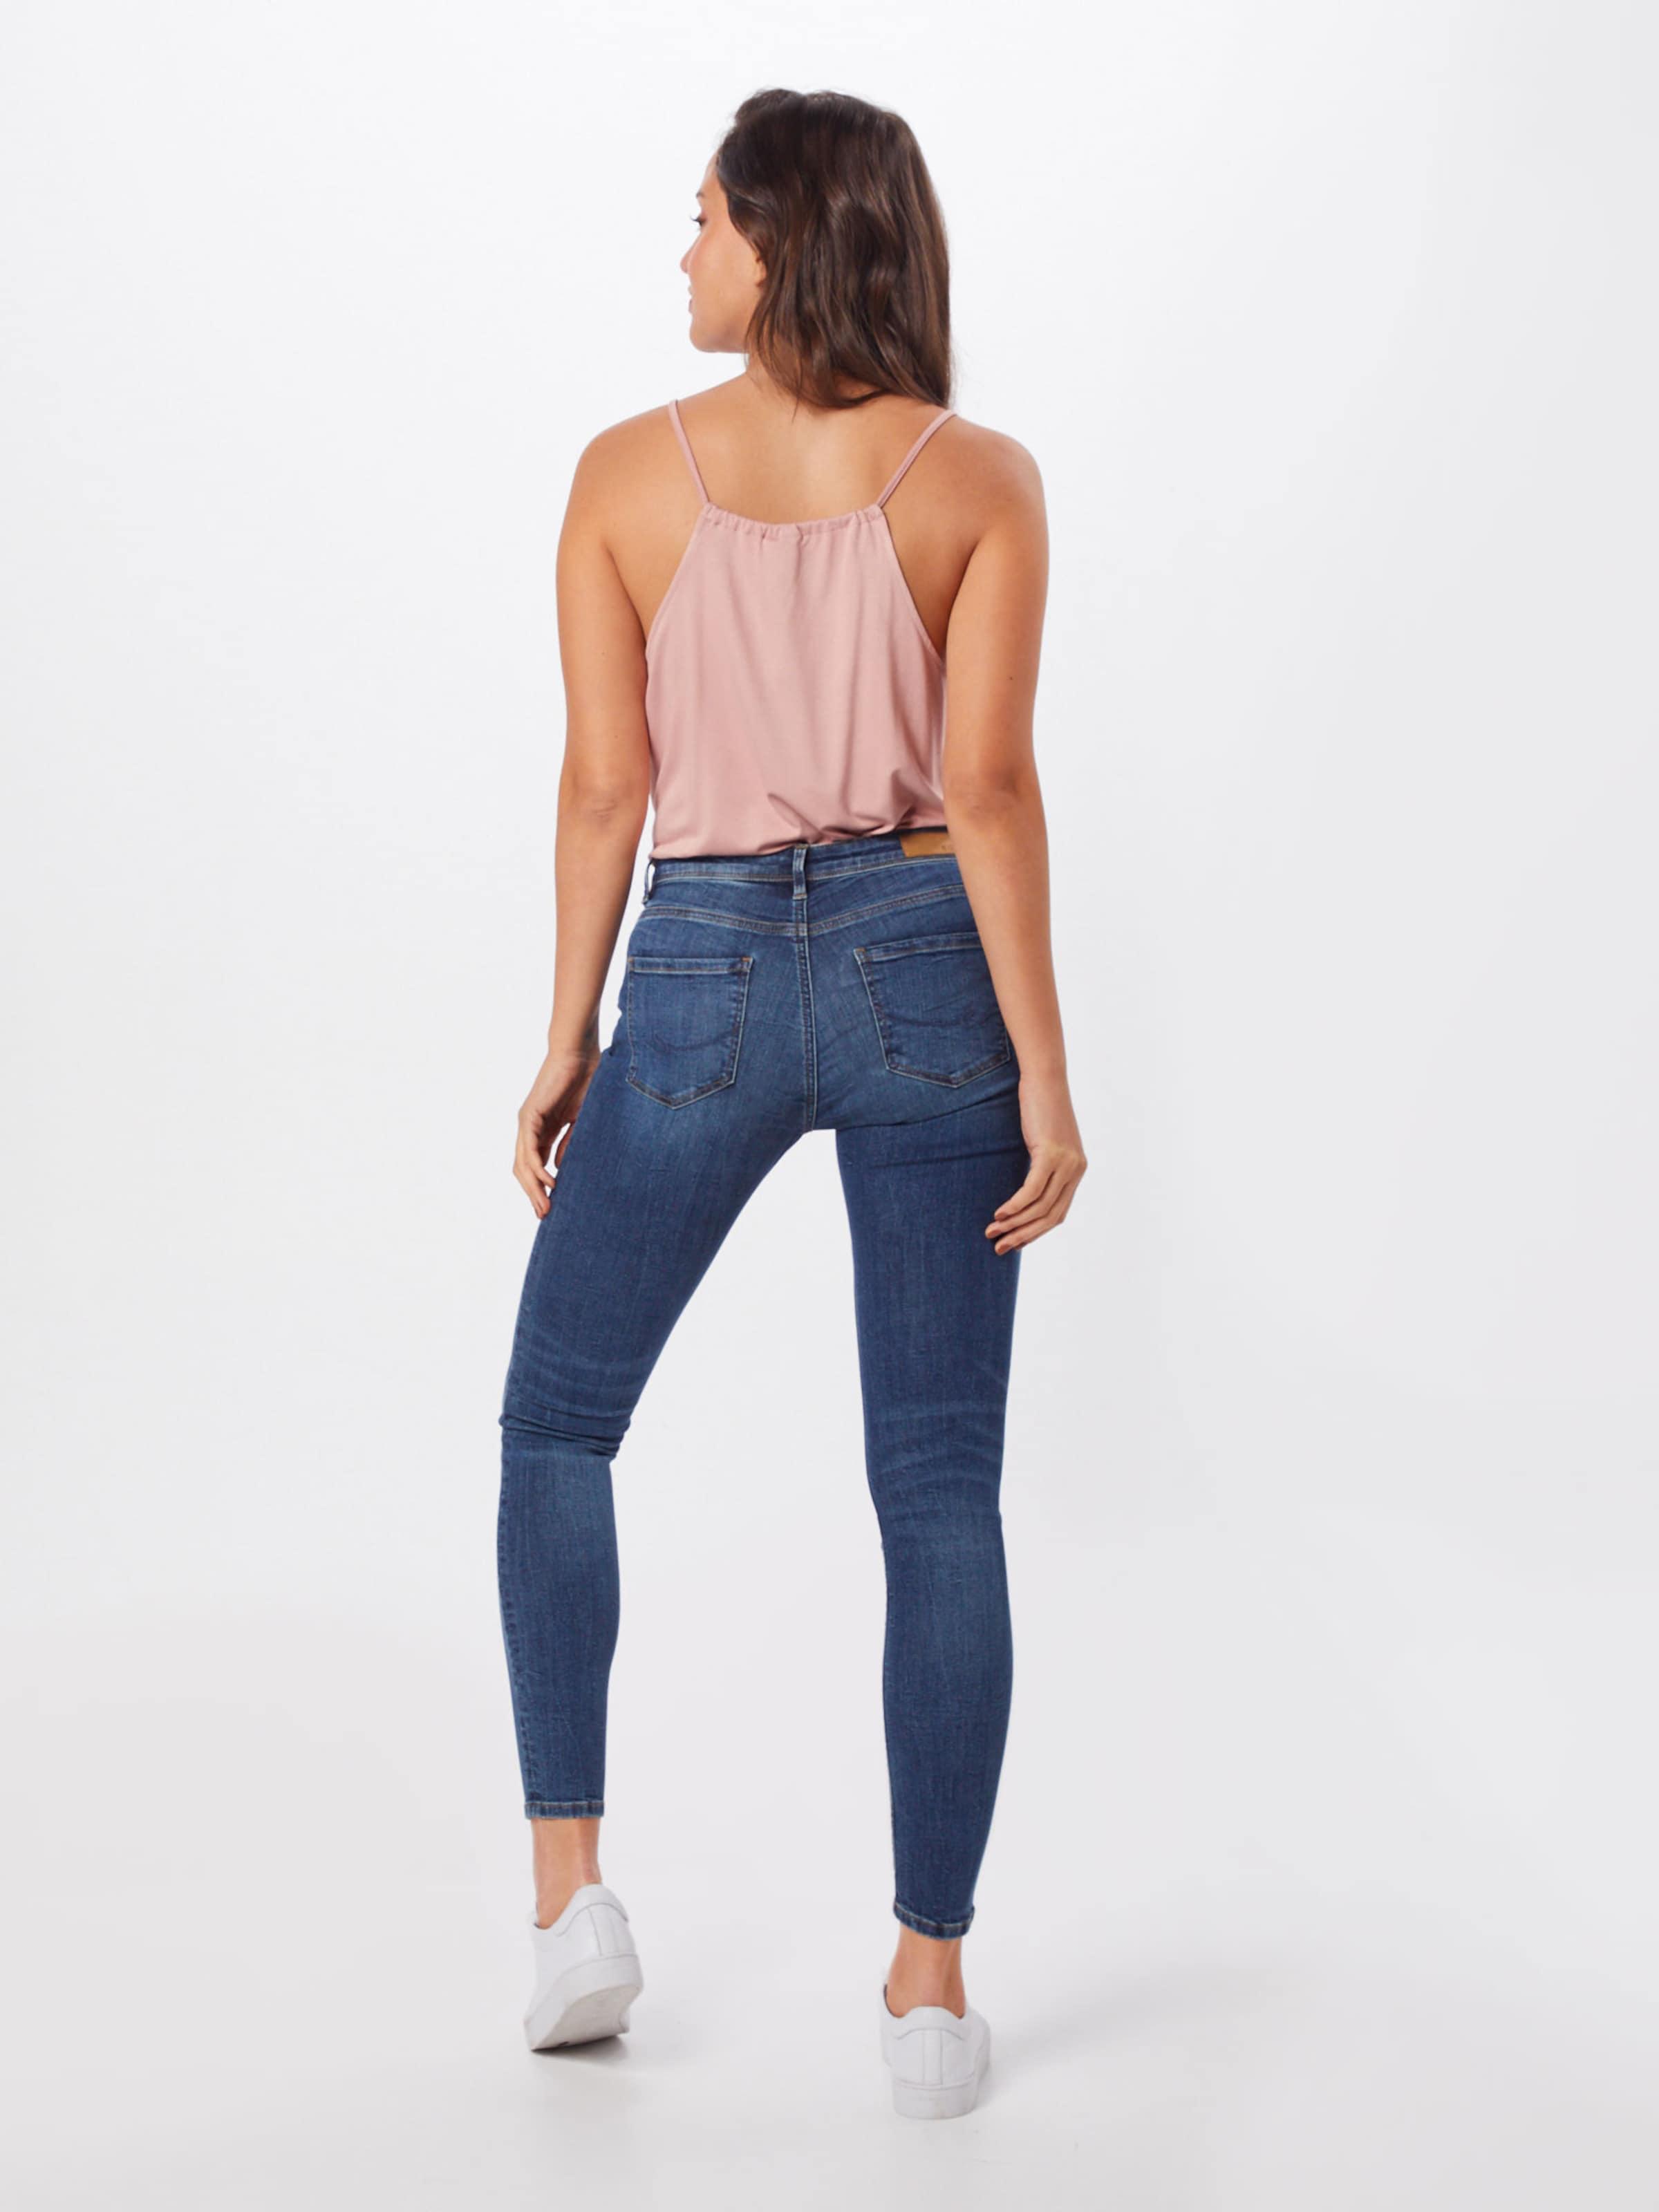 Esprit 'ocs By Jegging' Blue In Edc Jeans Denim USqVzpLMjG